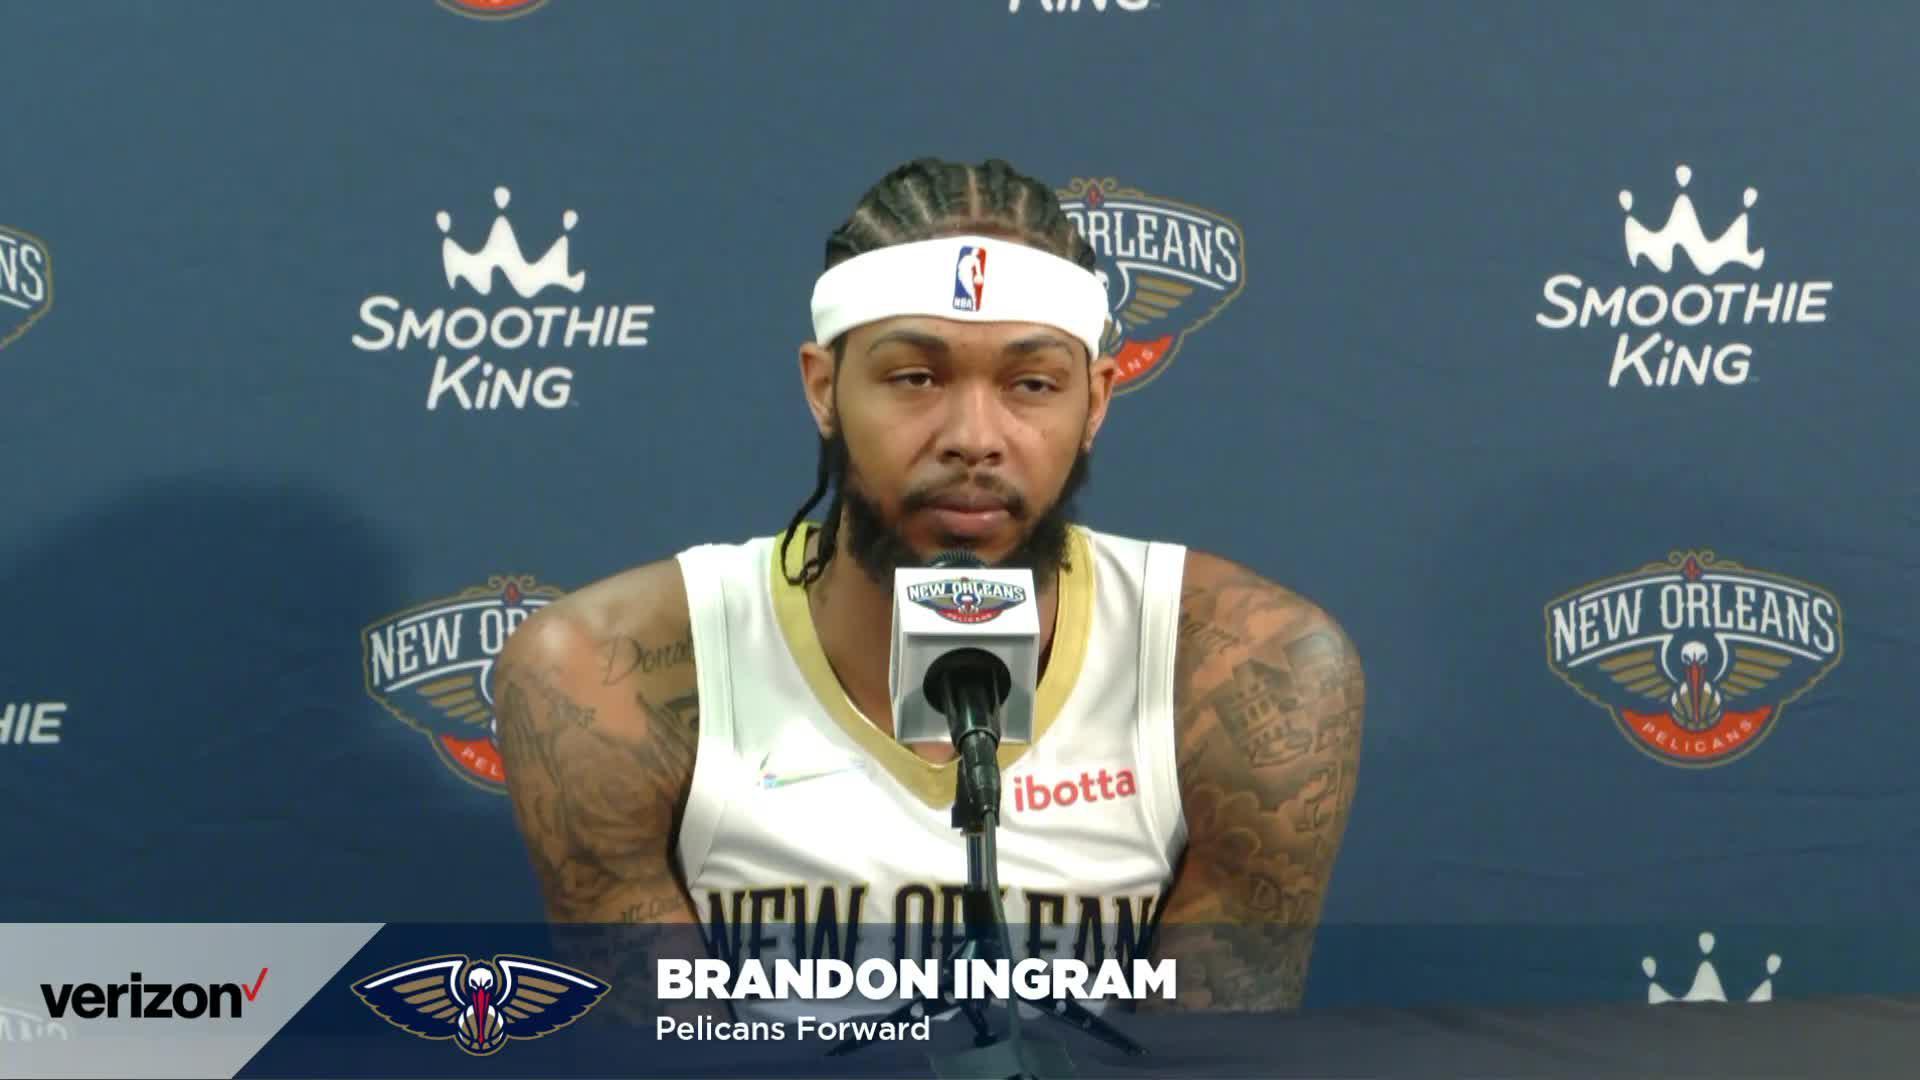 Brandon Ingram on his leadership, offseason goals | Pelicans Media Day 2021 Interviews